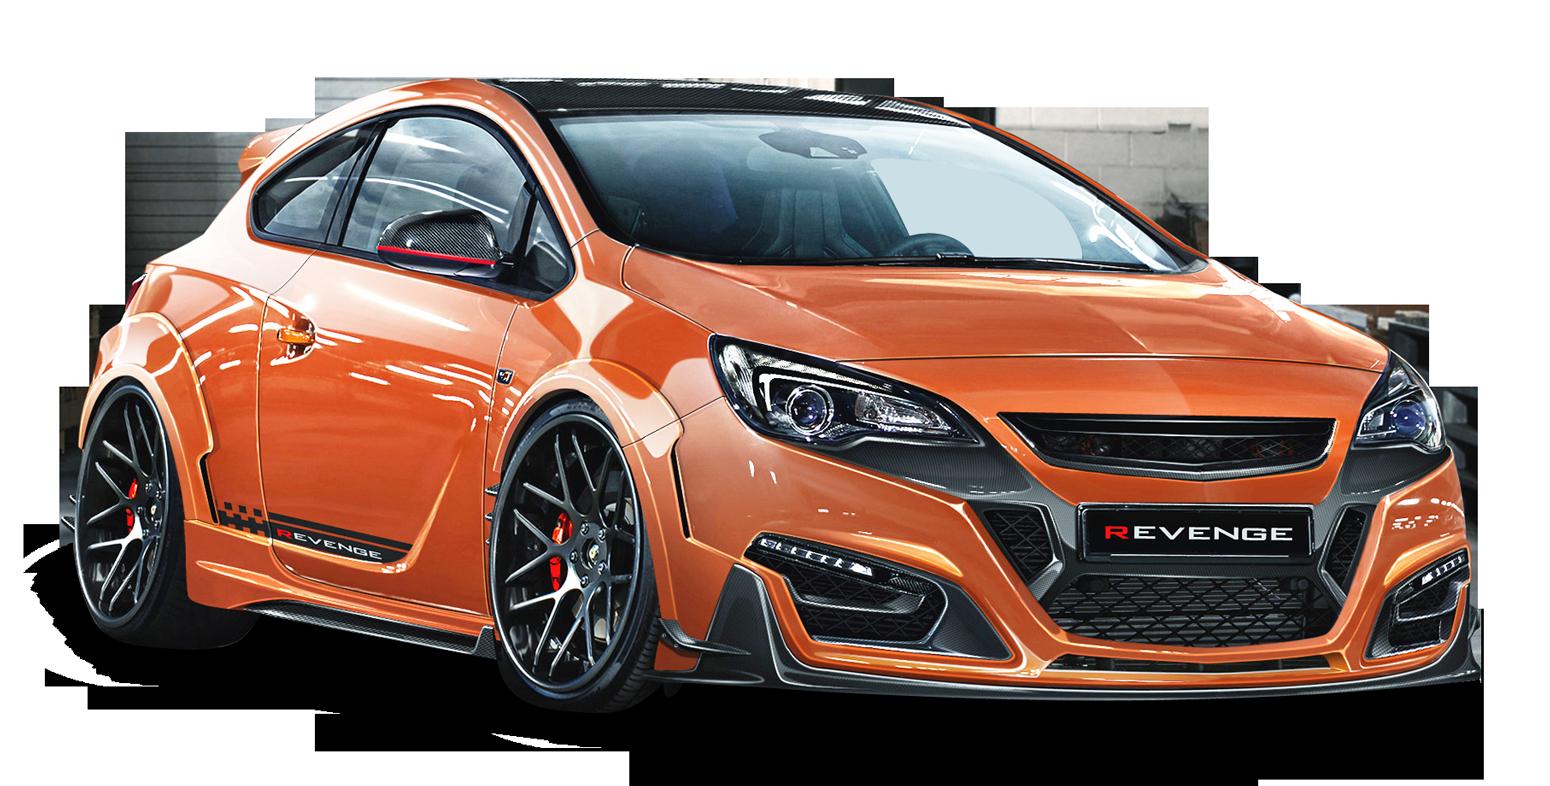 Opel Astra Gtc Revenge Orange Car Png Image Orange Car Vauxhall Motors Vauxhall Astra